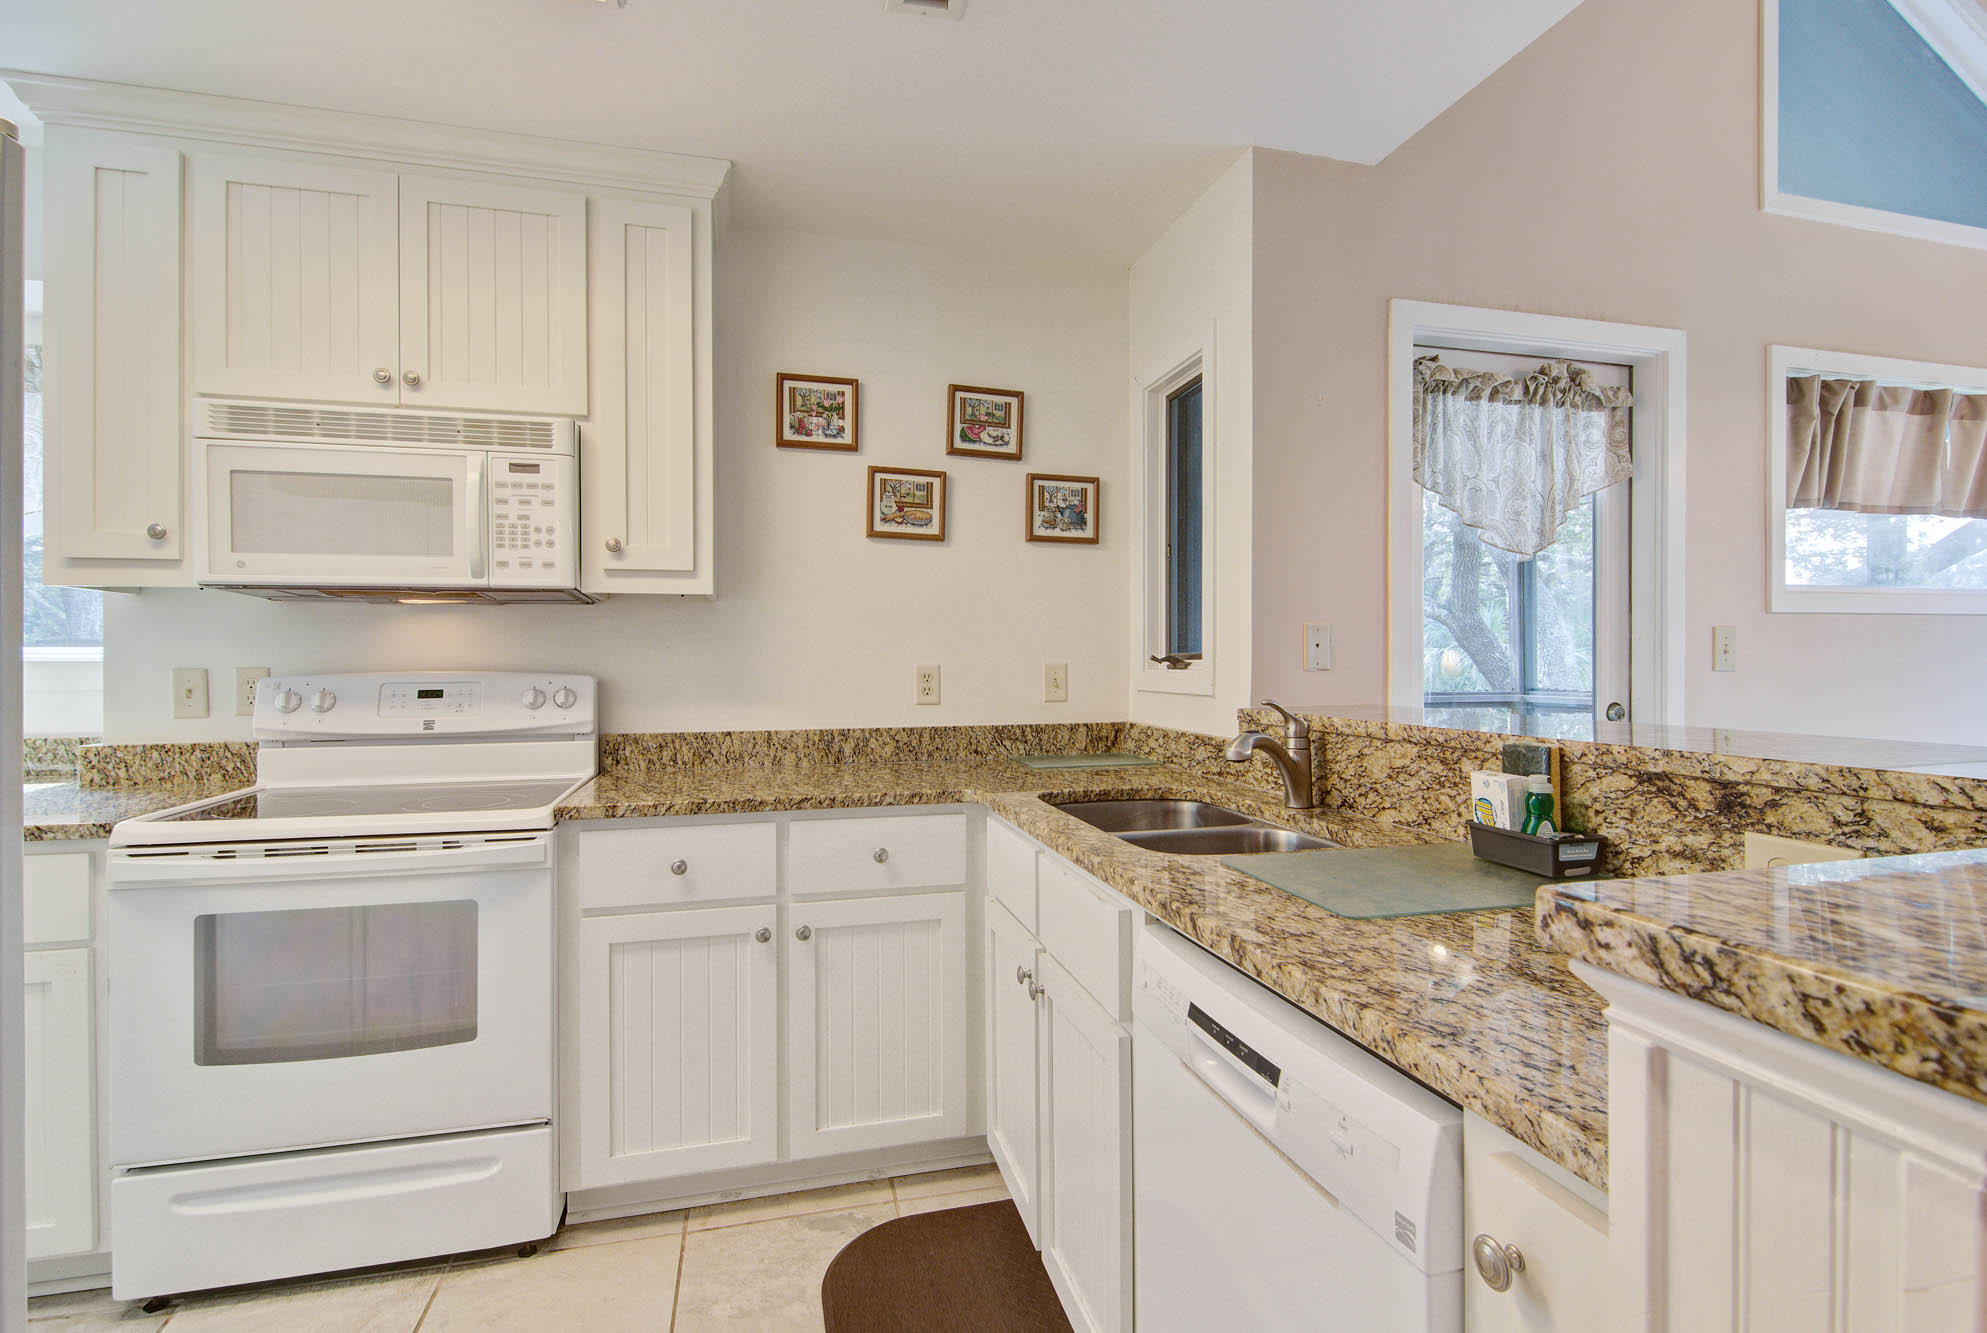 Kiawah Island Homes For Sale - 4504 Park Lake, Kiawah Island, SC - 4